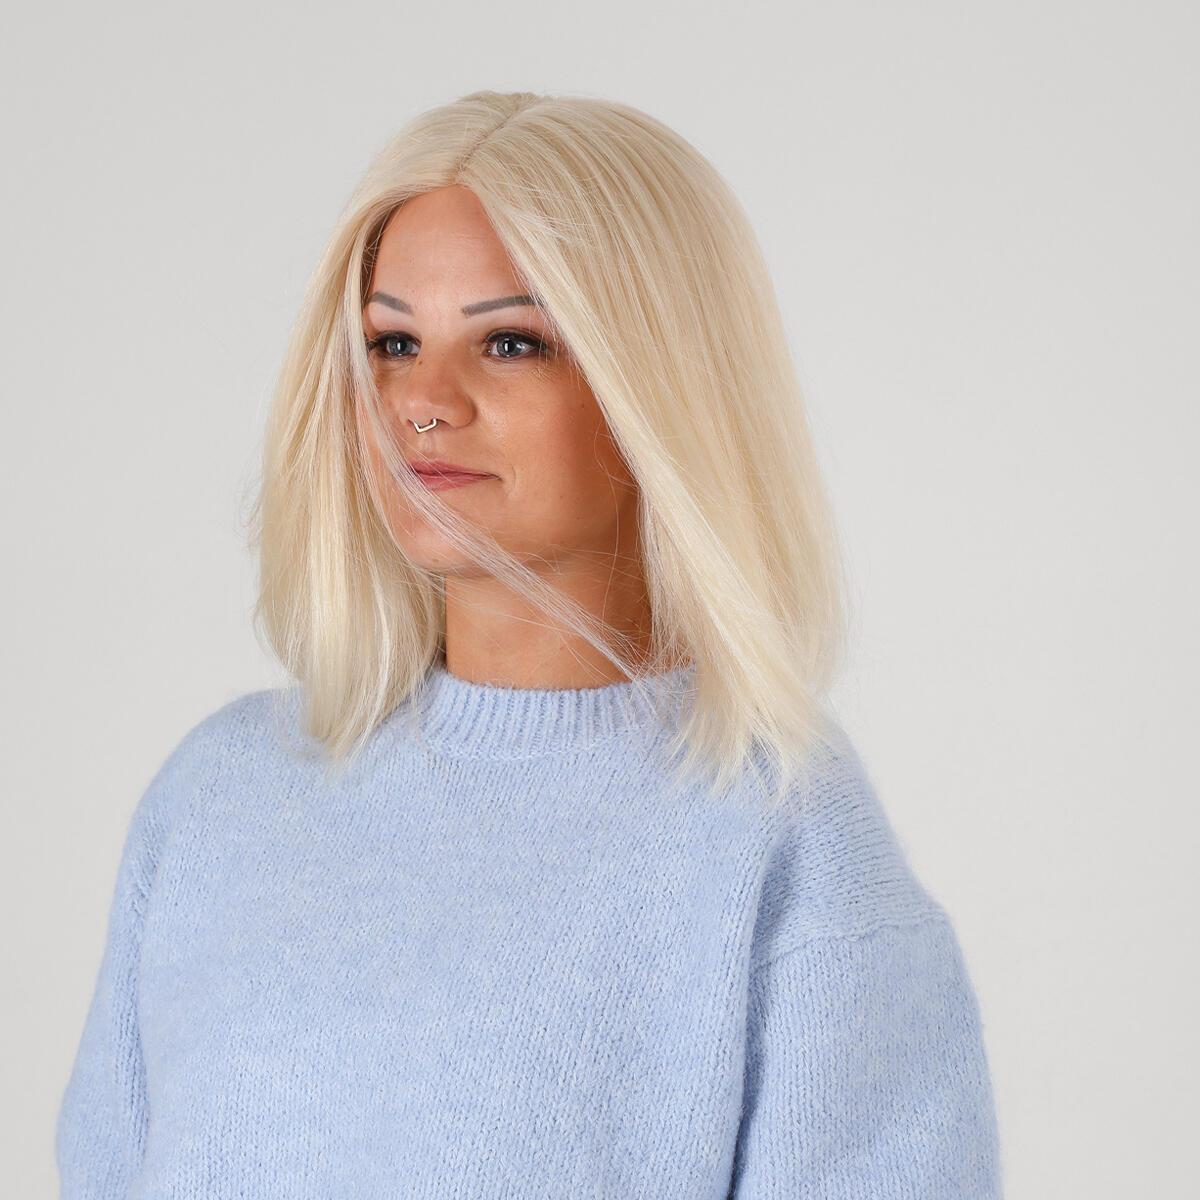 Lace Wig 10.8 Light Blonde 35 cm